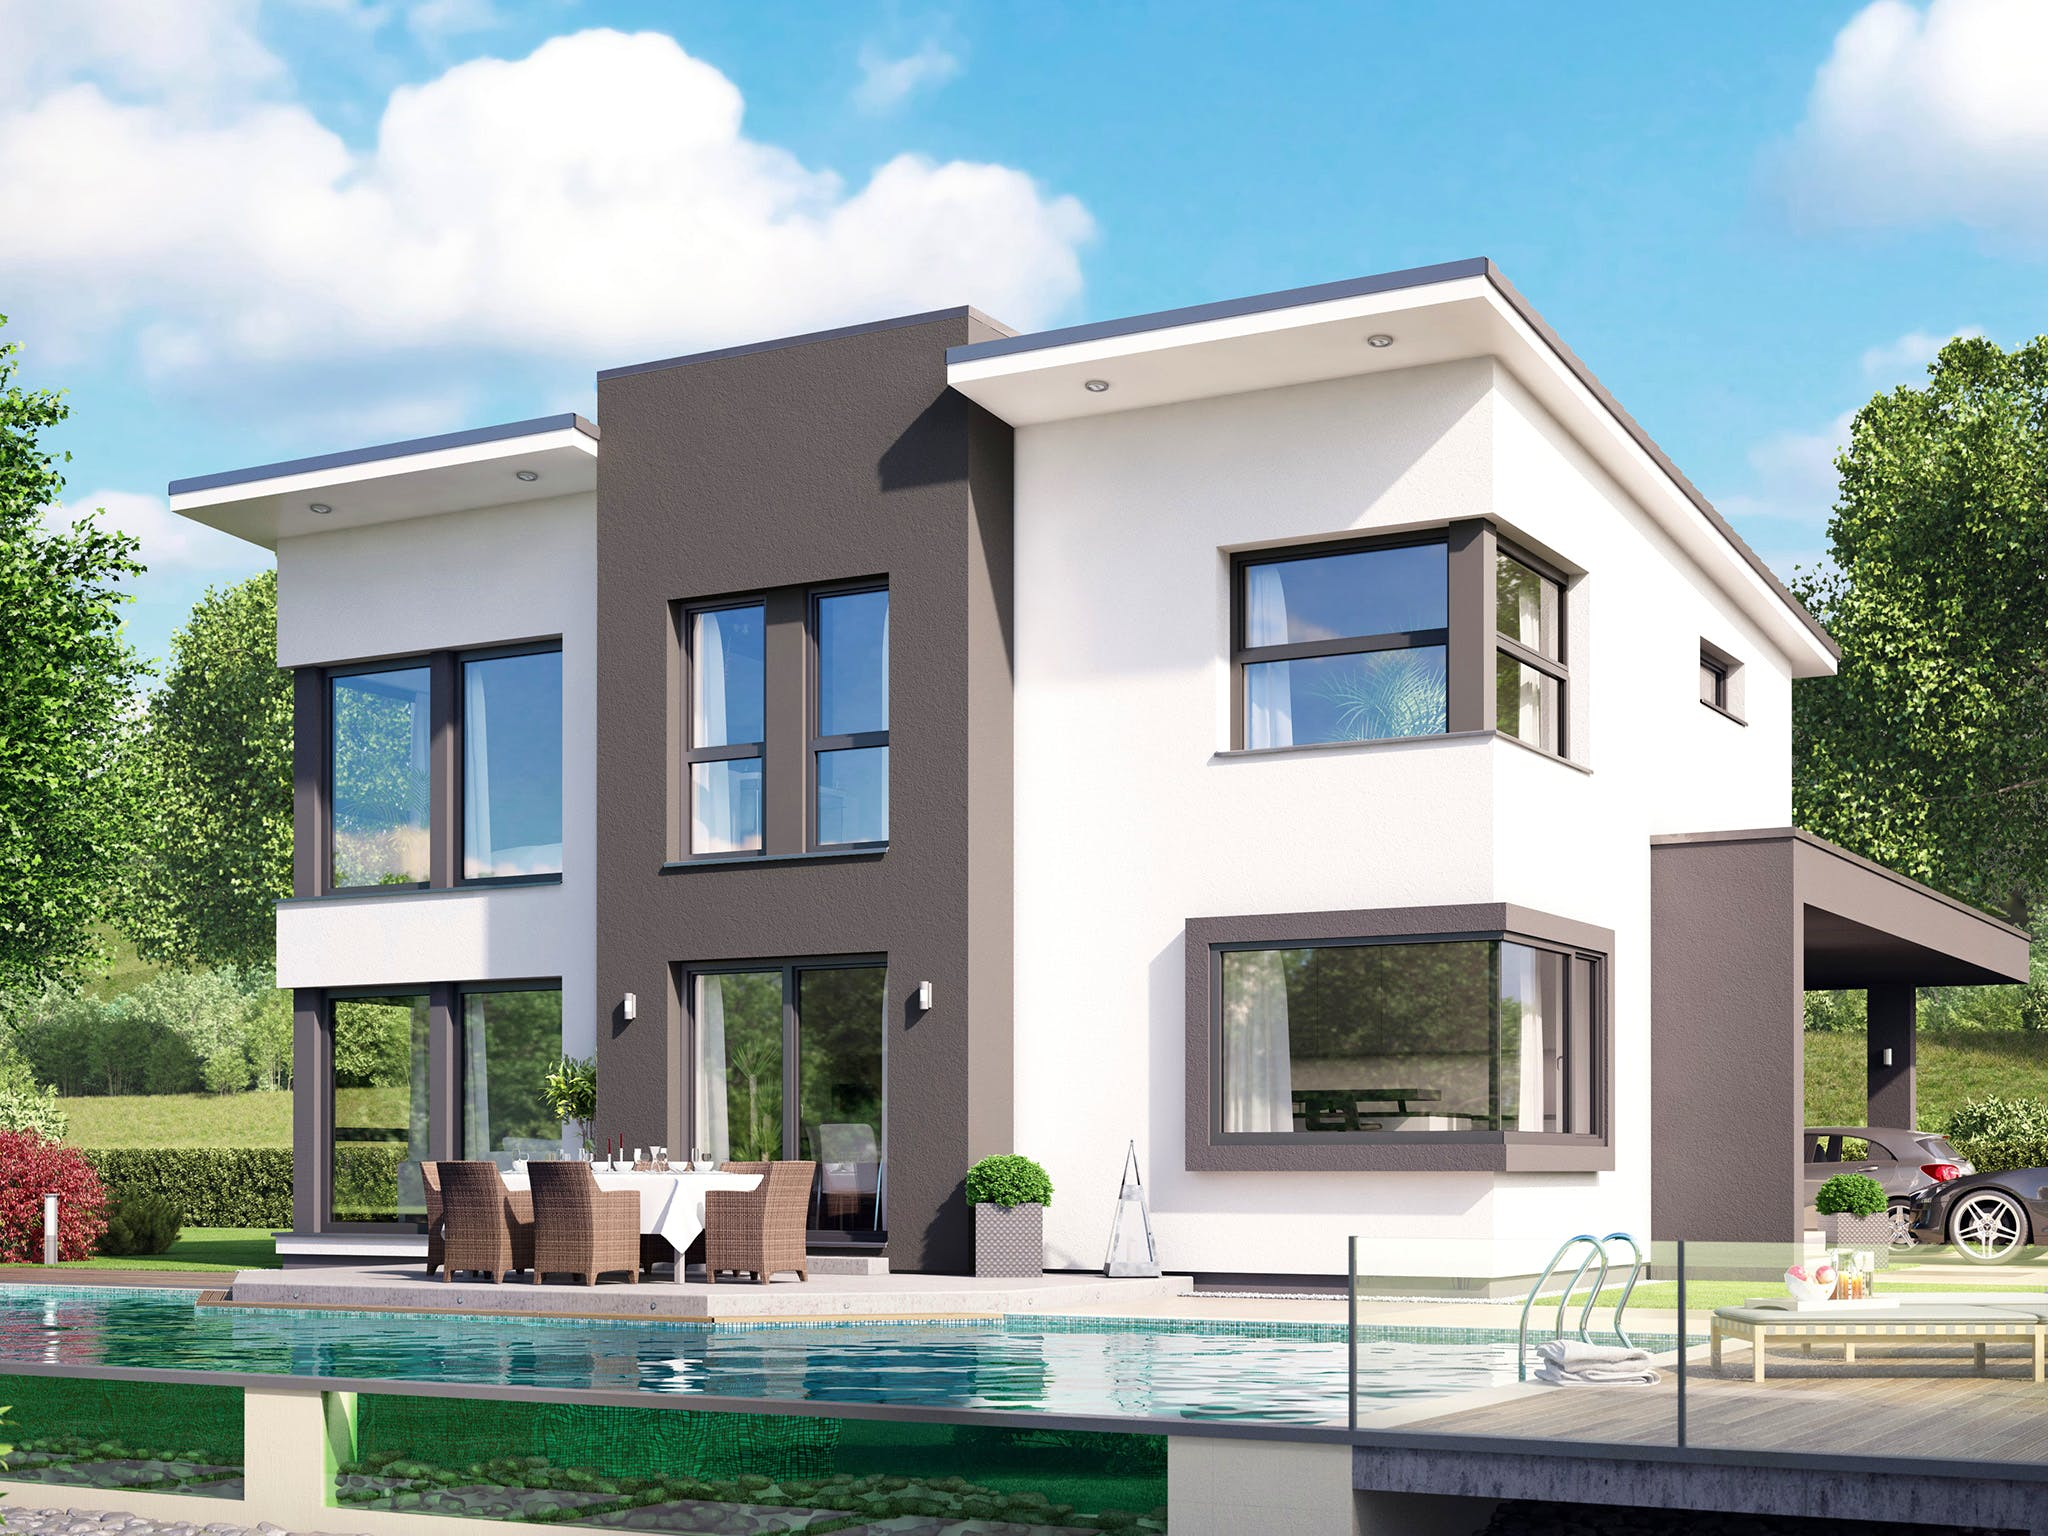 Hausstil modern